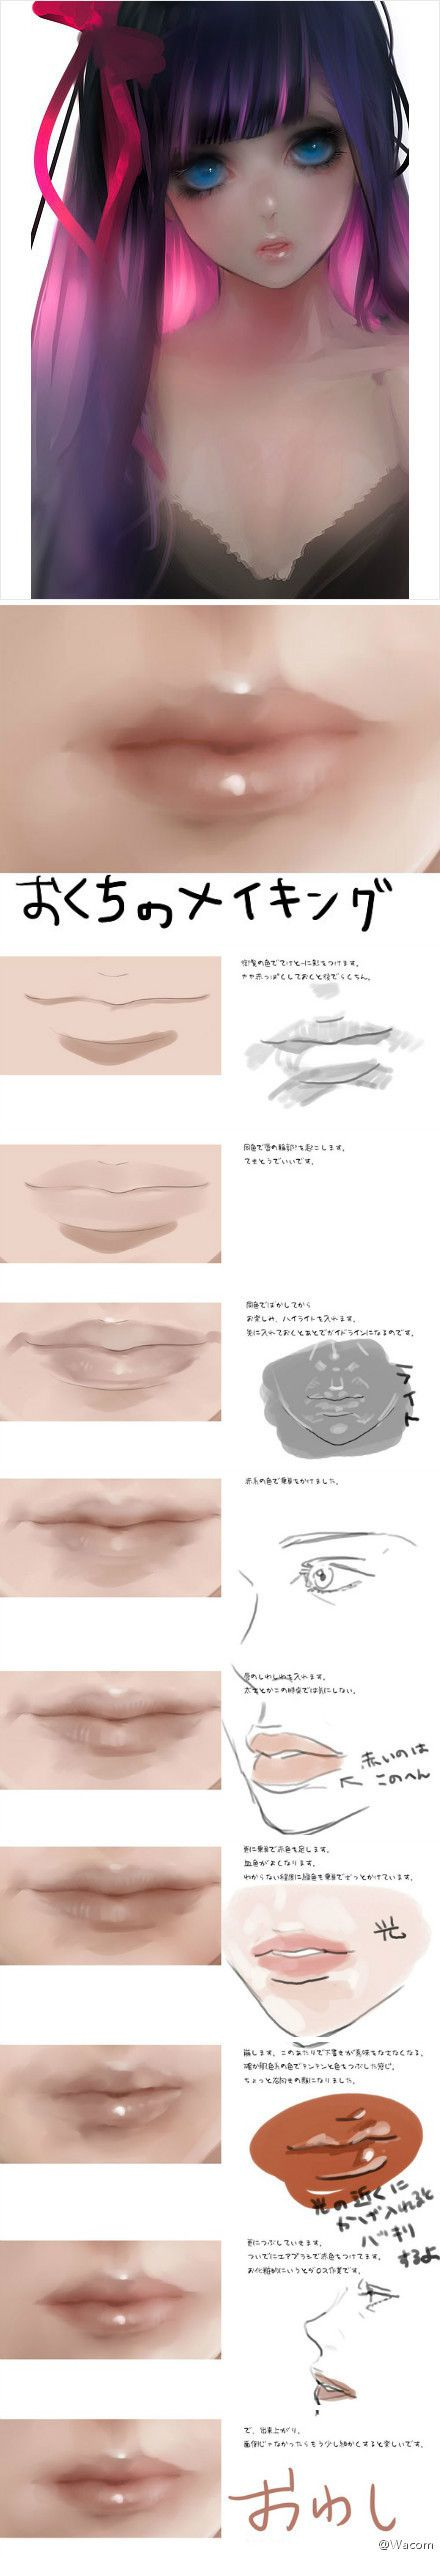 CG绘技法收集——嘴巴@原画梦采集到作画教程(367图)_花瓣插画/漫画